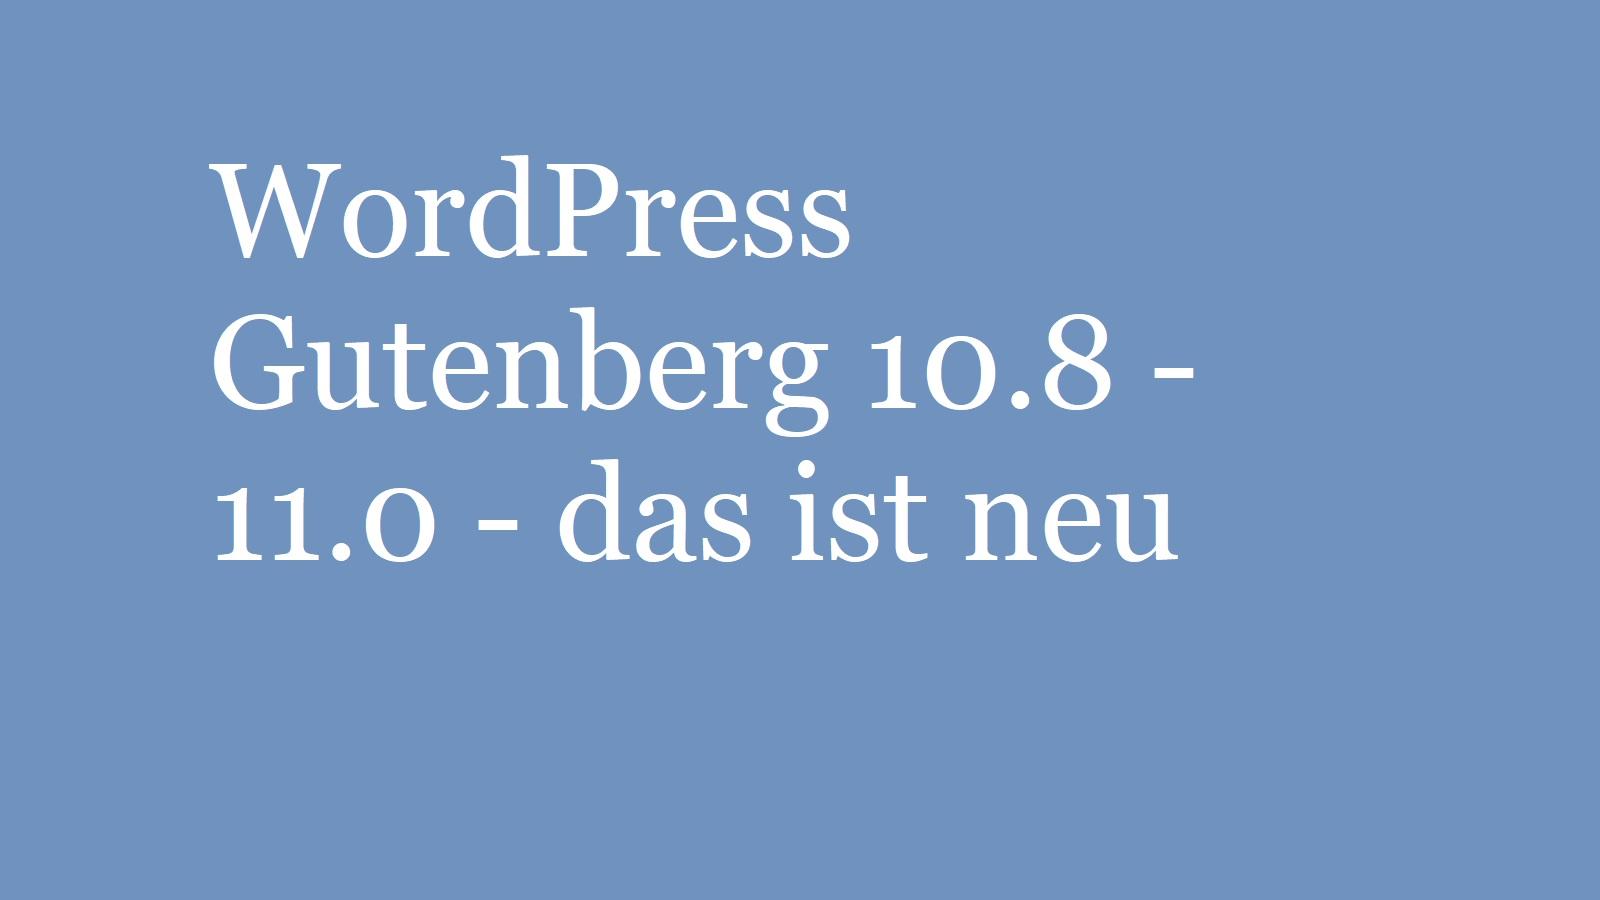 wordpress-gutenberg-10.8-11.0